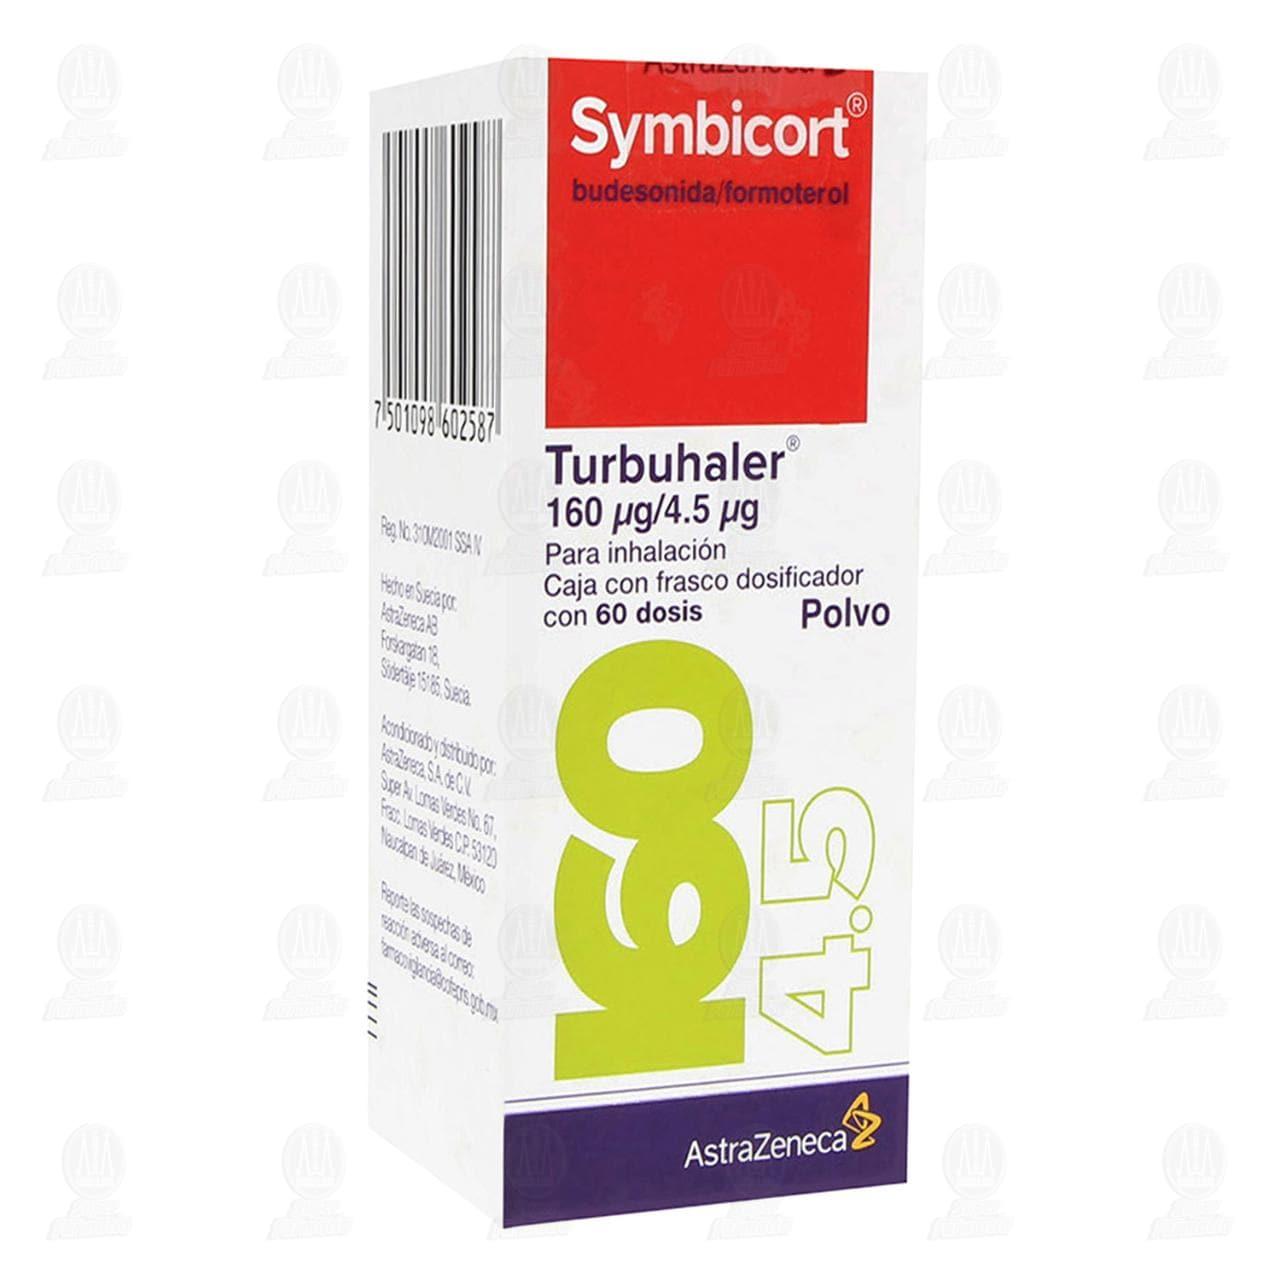 Comprar Symbicort Turbuhaler Polvo 160mcg/4.5mcg 60 Dosis en Farmacias Guadalajara